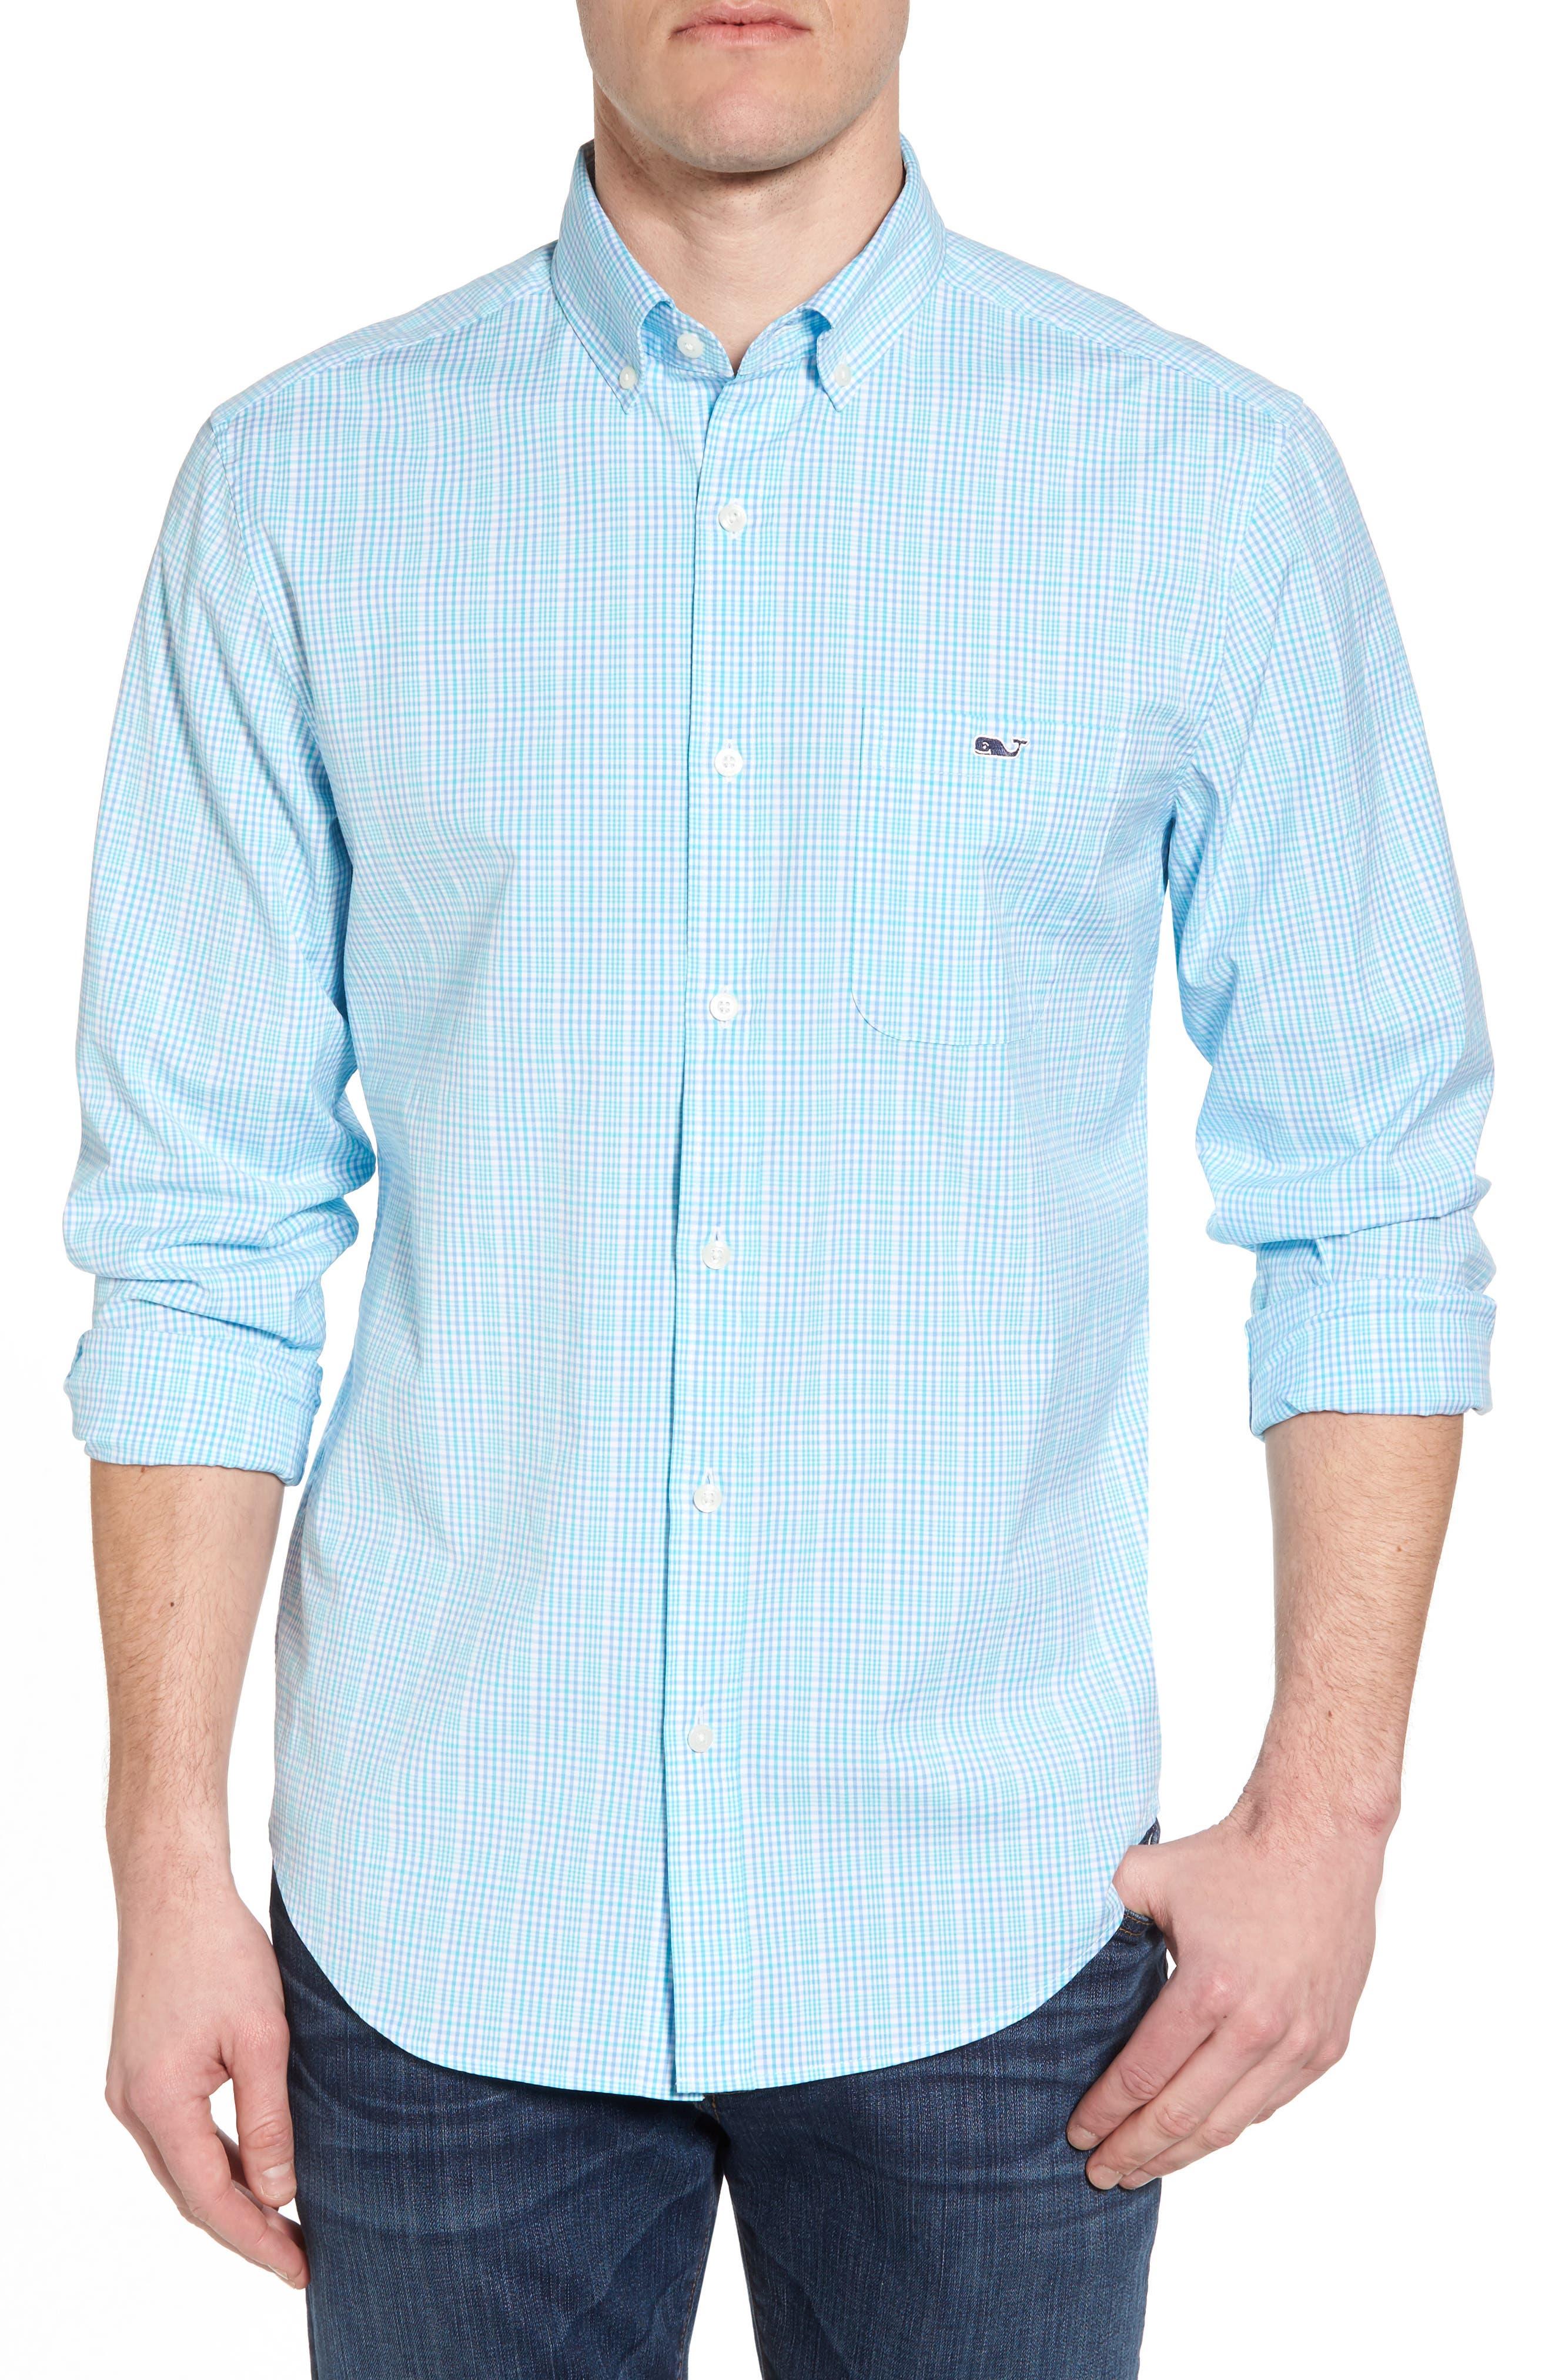 Rolling Harbor Classic Fit Plaid Sport Shirt,                             Main thumbnail 1, color,                             Turquoise